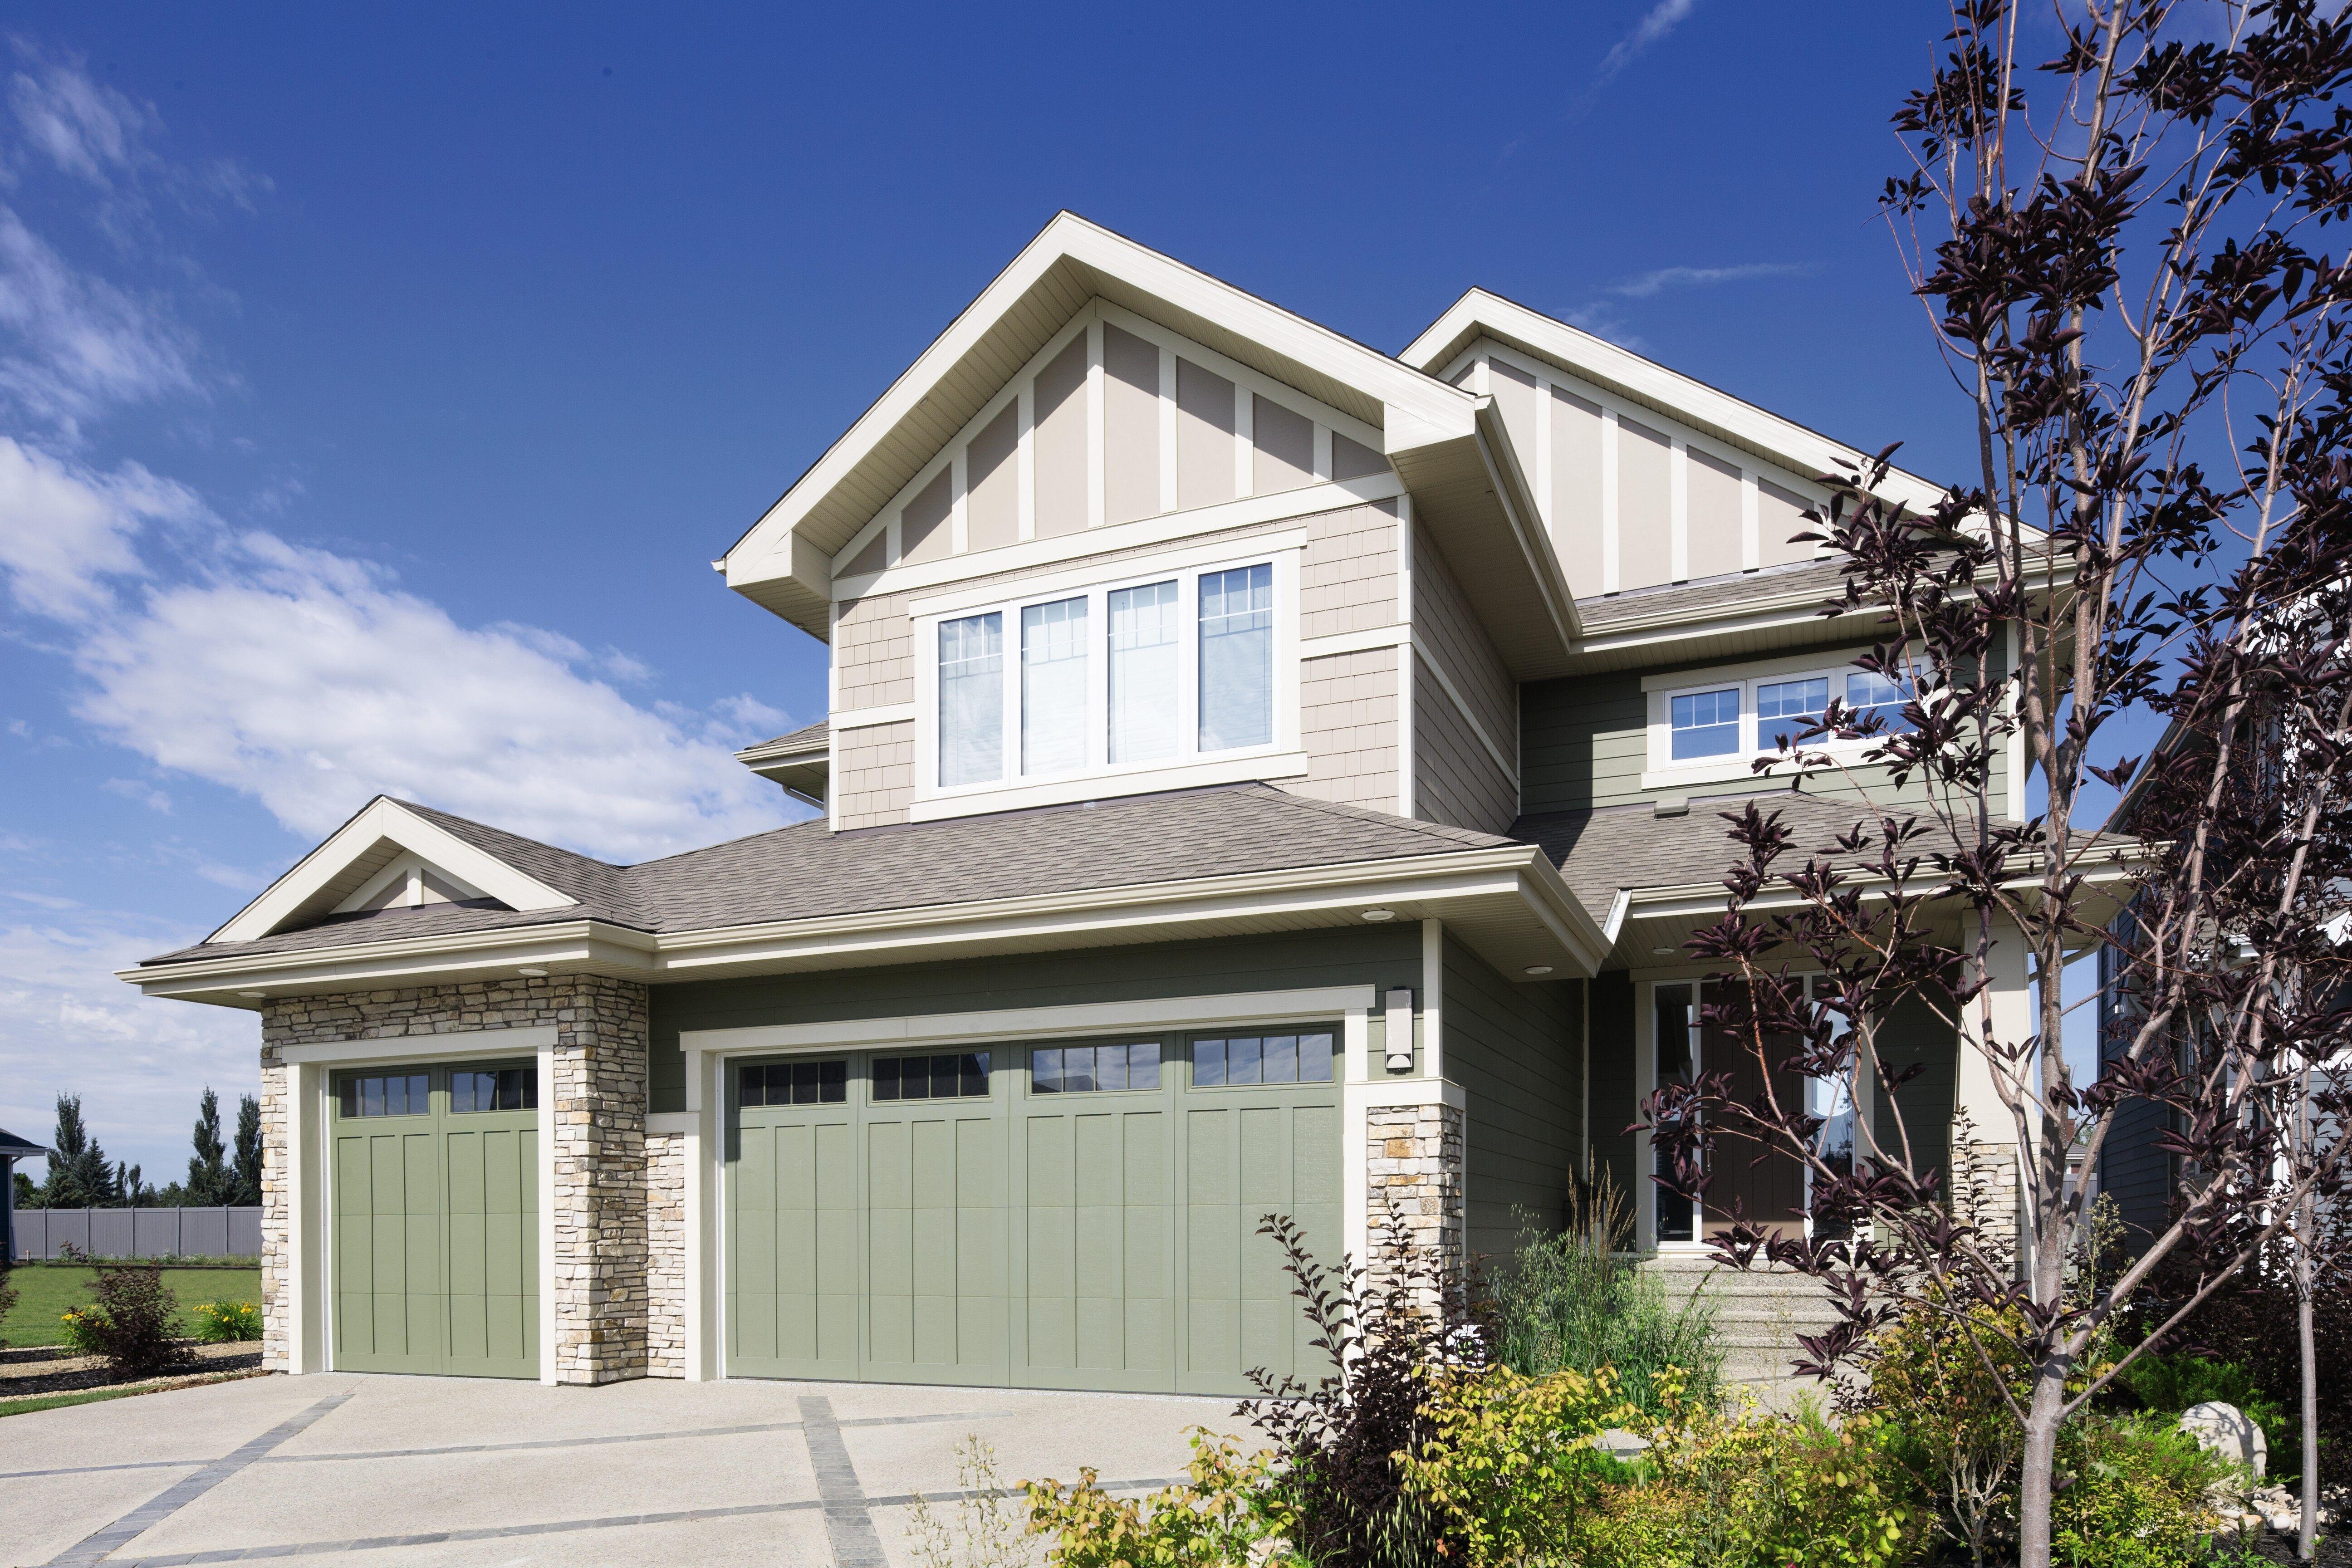 wayne-dalton-garage-door.jpeg?mtime=20190812093610#asset:13788